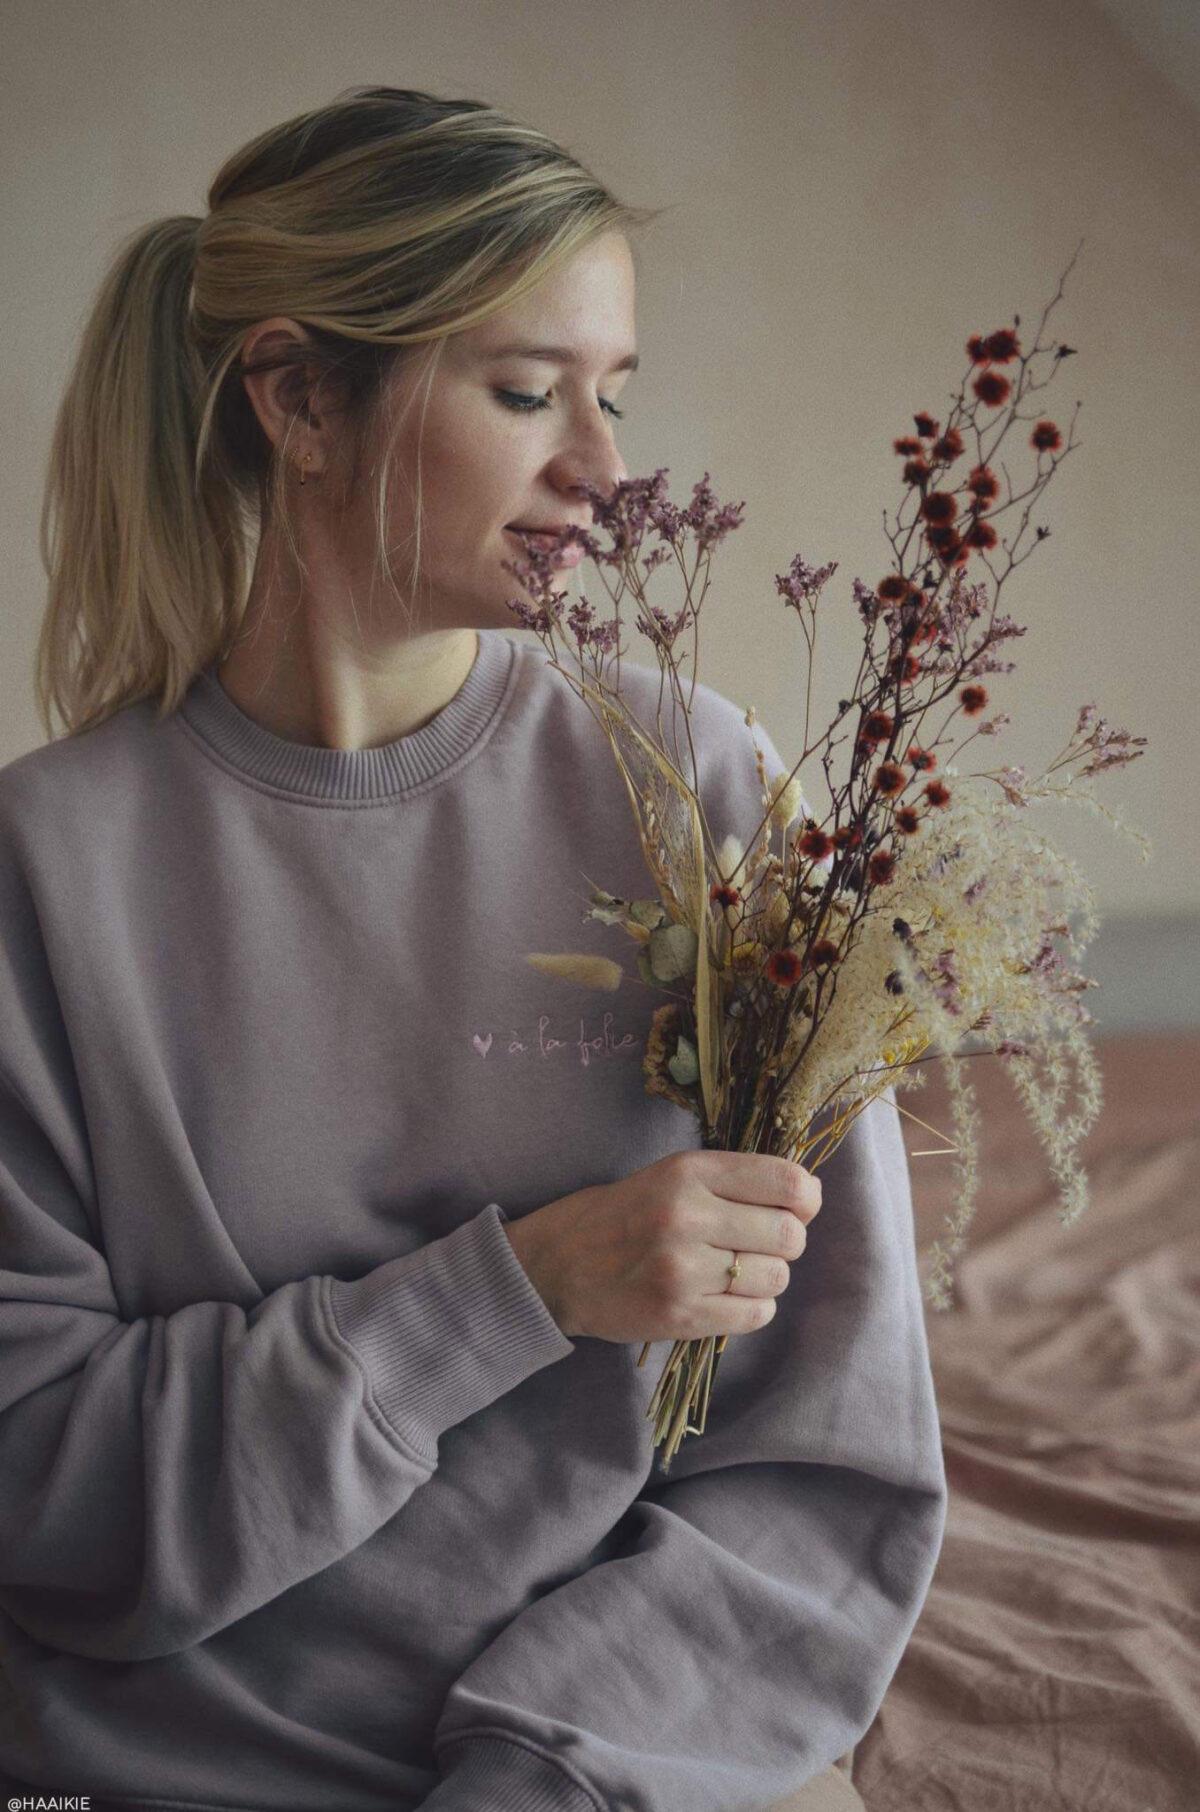 à la folie sweater by Mangos on Monday - haaikie